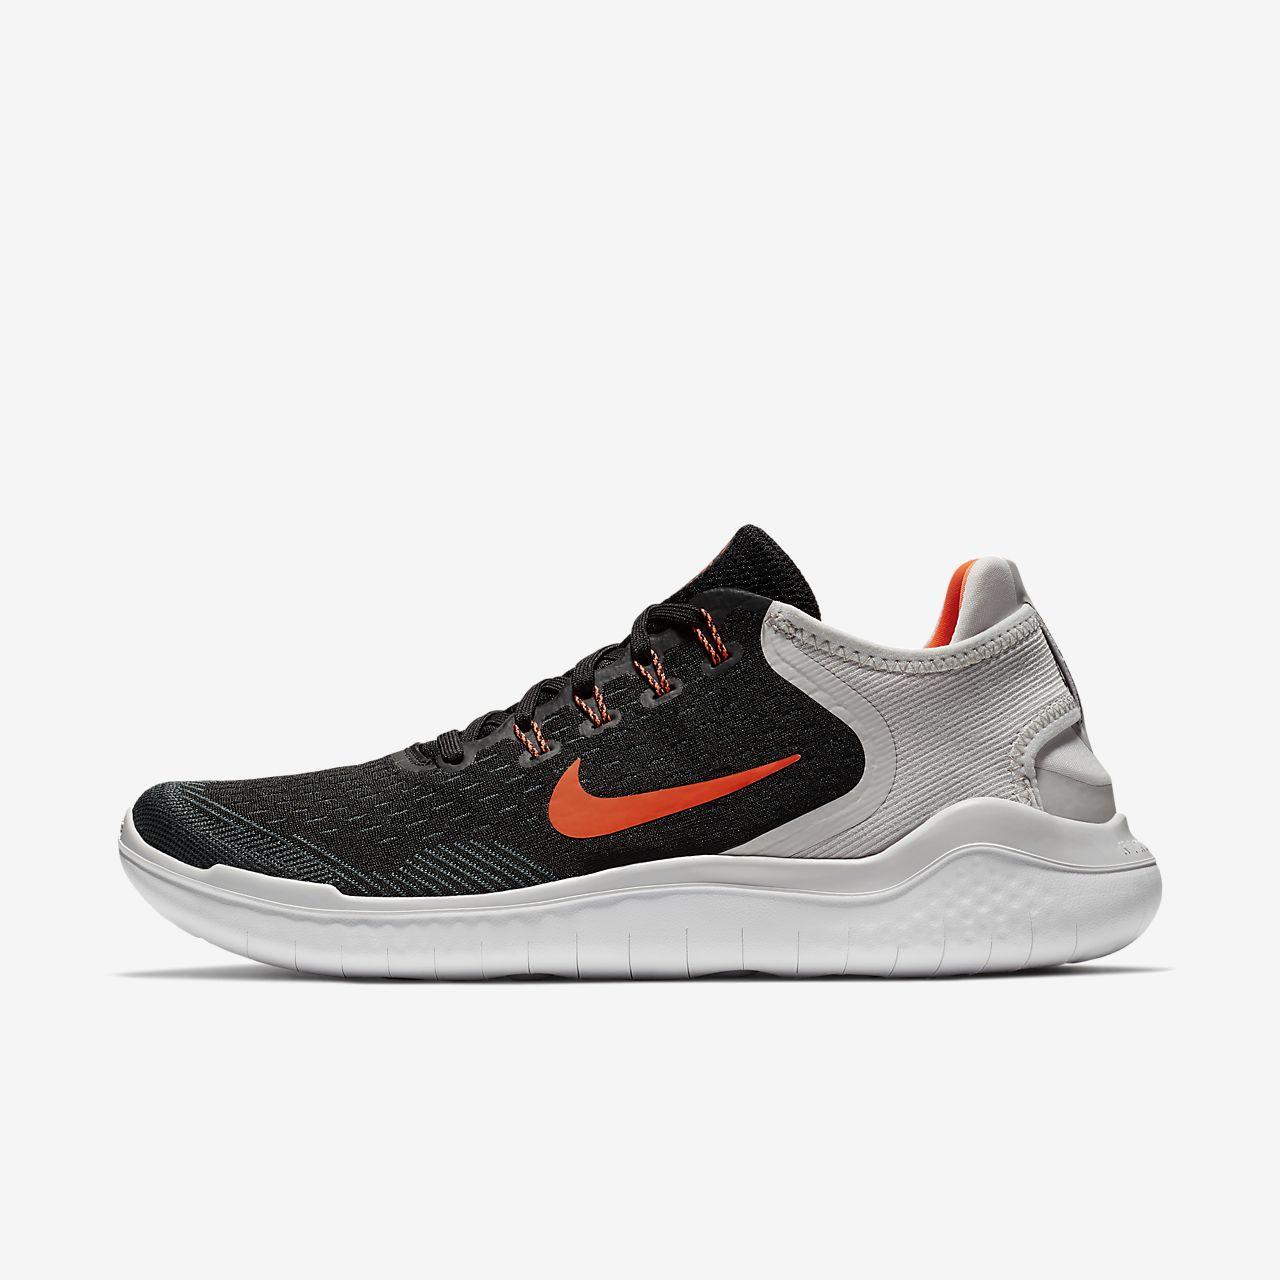 f1785fc1c3bab Nike Free RN 2018 Men s Running Shoe. Nike.com RO